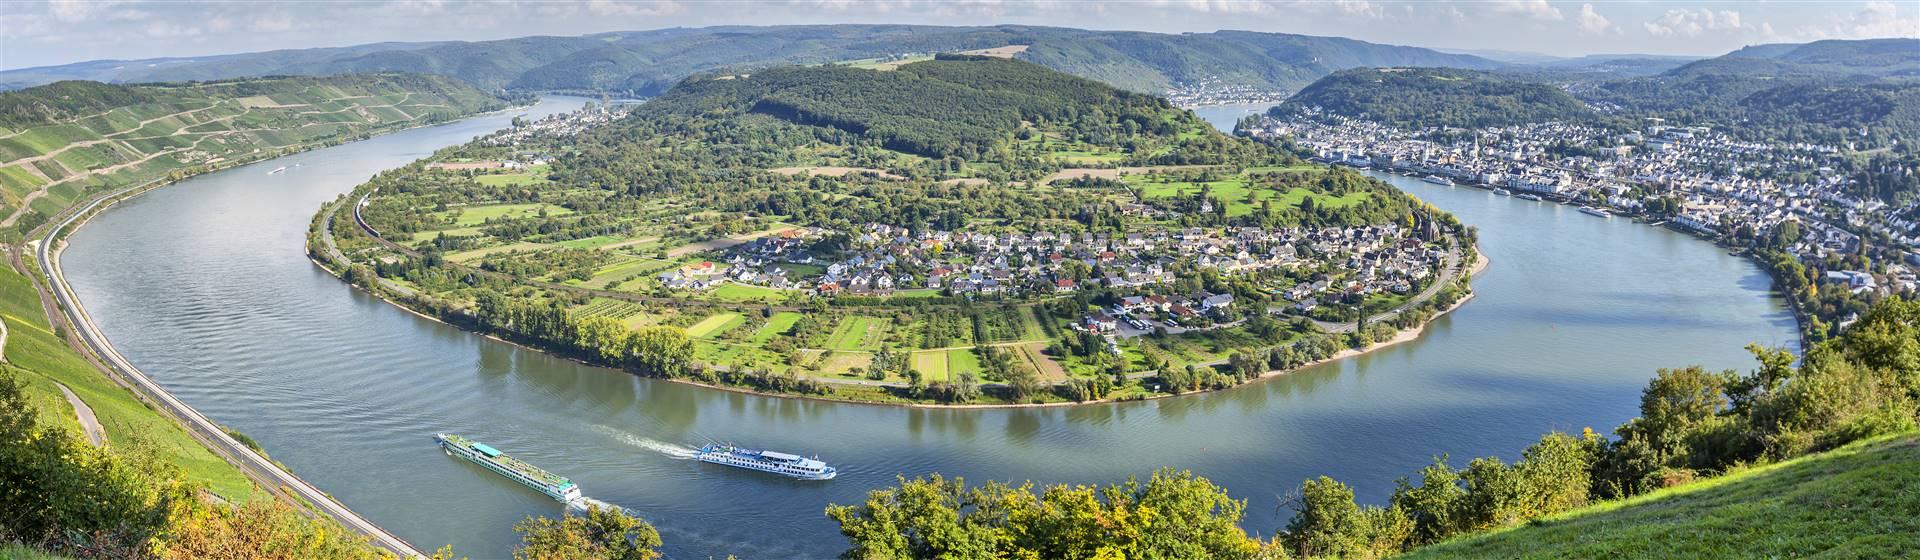 "<img src=""boppard_on_rhine©shutterstock.jpeg"" alt=""Boppard on the Rhine""/>"